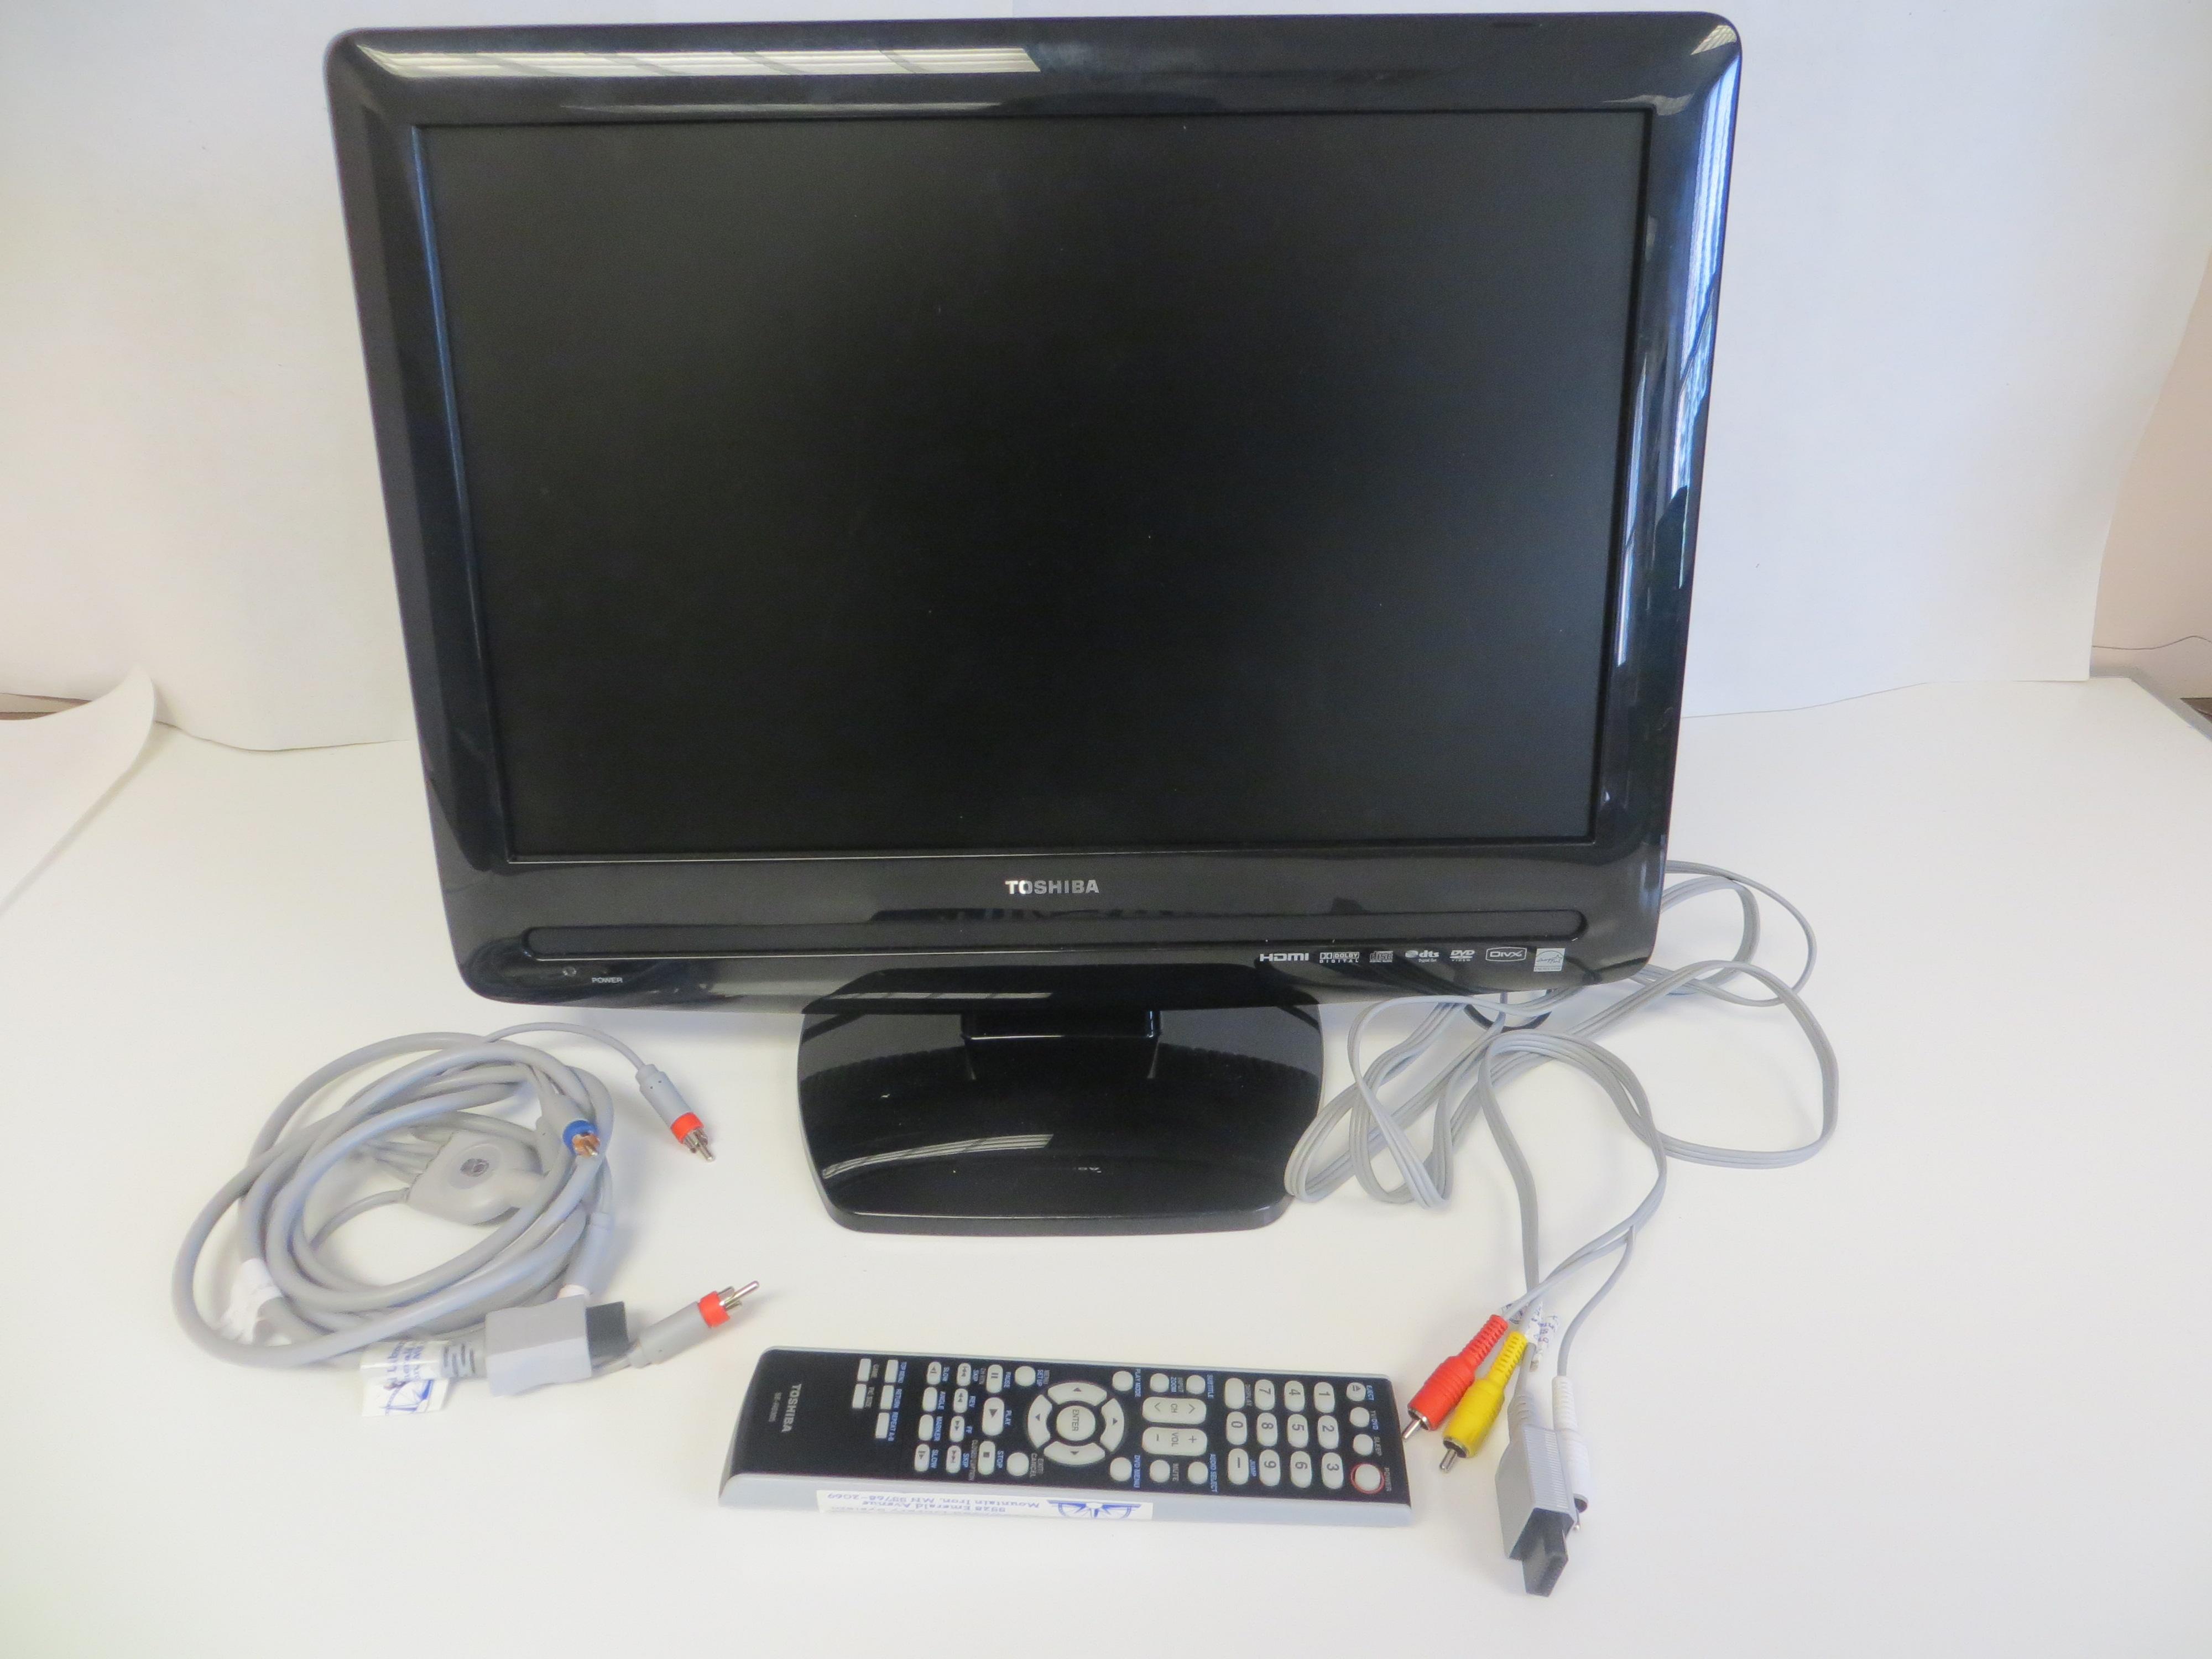 Toshiba 19 inch LCD